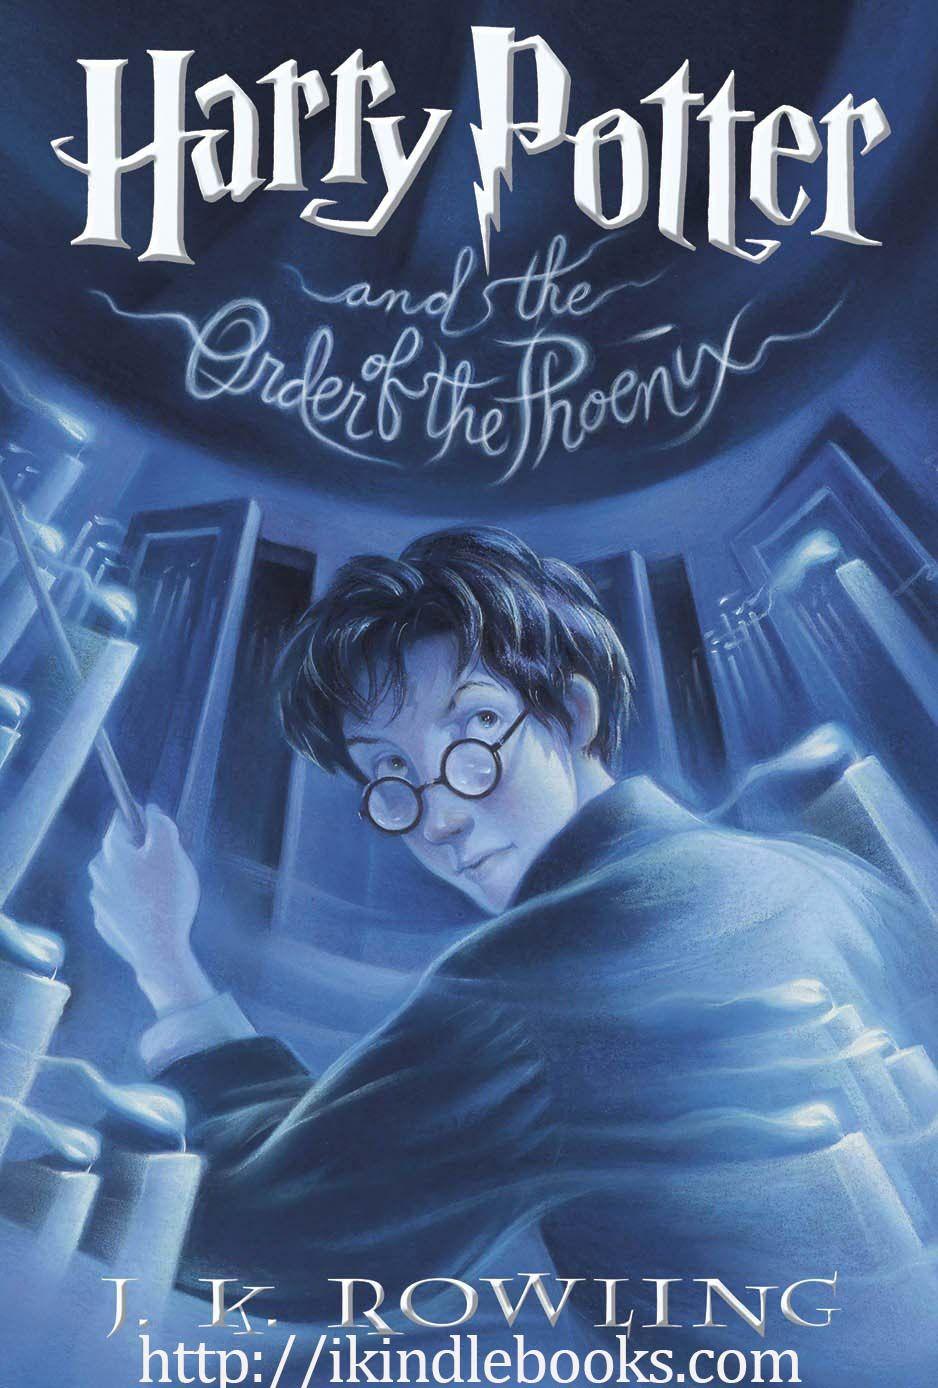 Harry Potter Series Full 7 Ebook By J K Rowling Harry Potter Book 5 Harry Potter Book Covers Kids Book Series